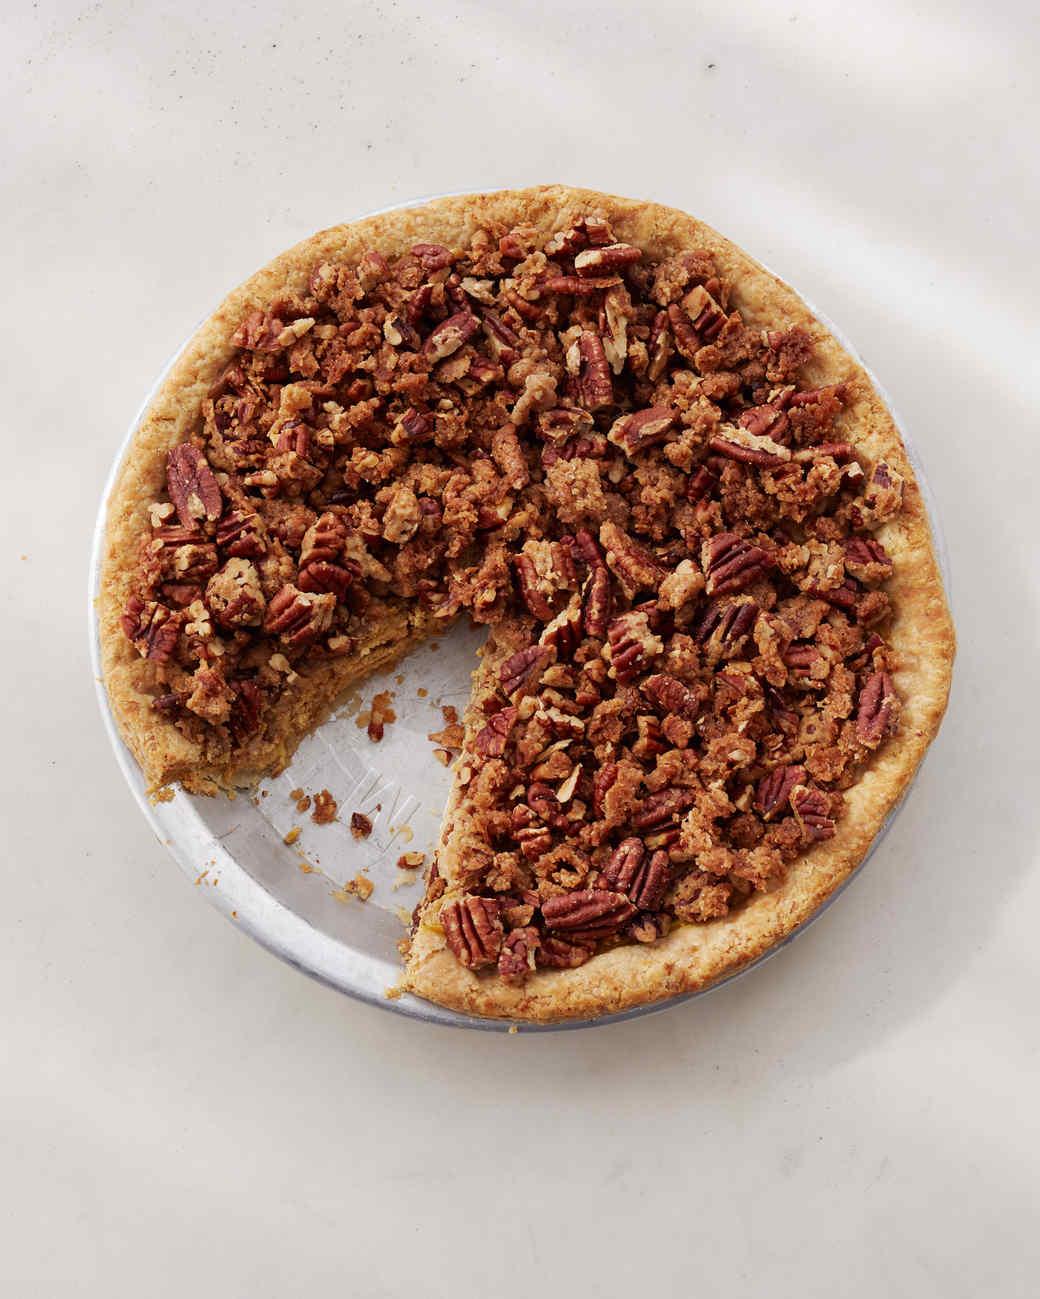 pumpkin-crunch-pie-281-ms-6190441.jpg